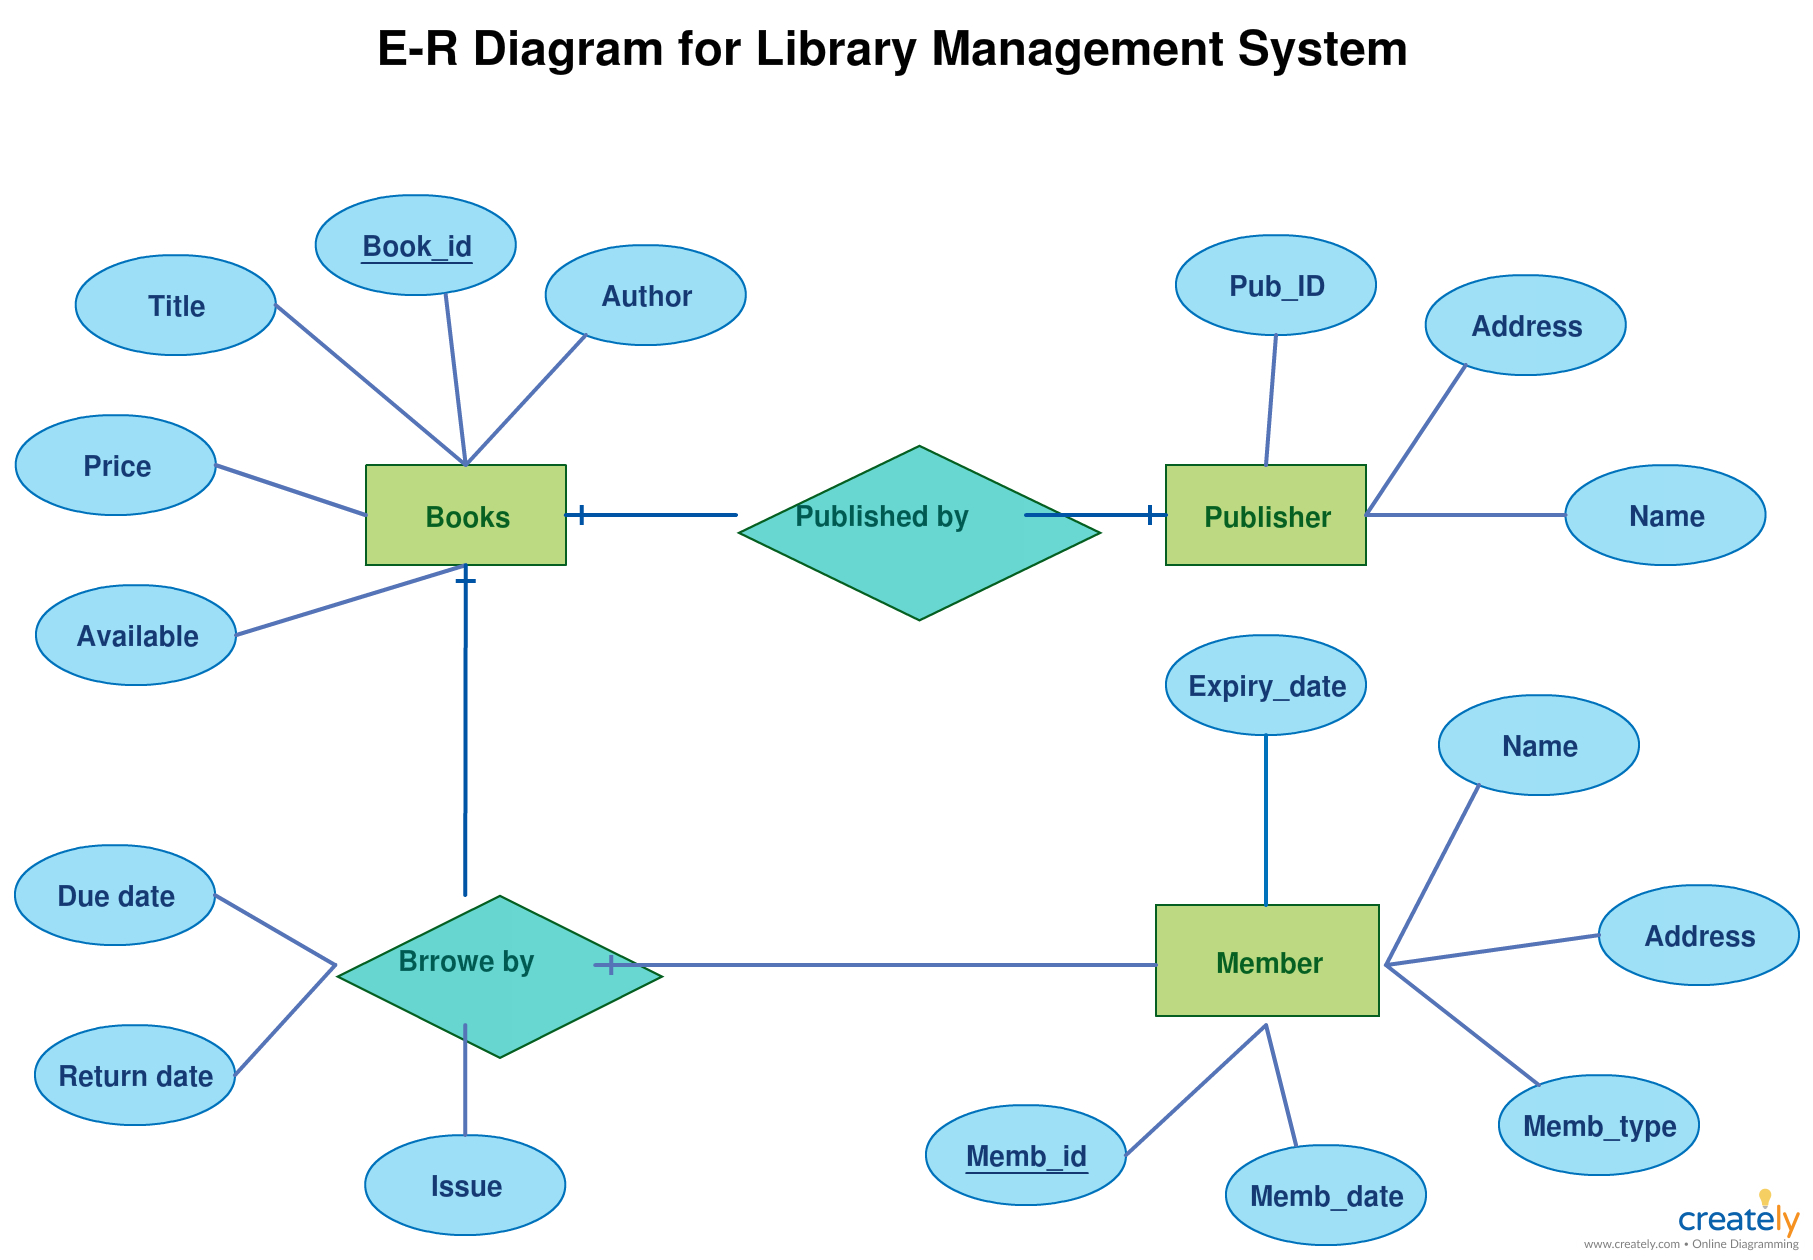 Er Diagram Tutorial | Relationship Diagram, Data Flow pertaining to Er Diagram Book Publisher